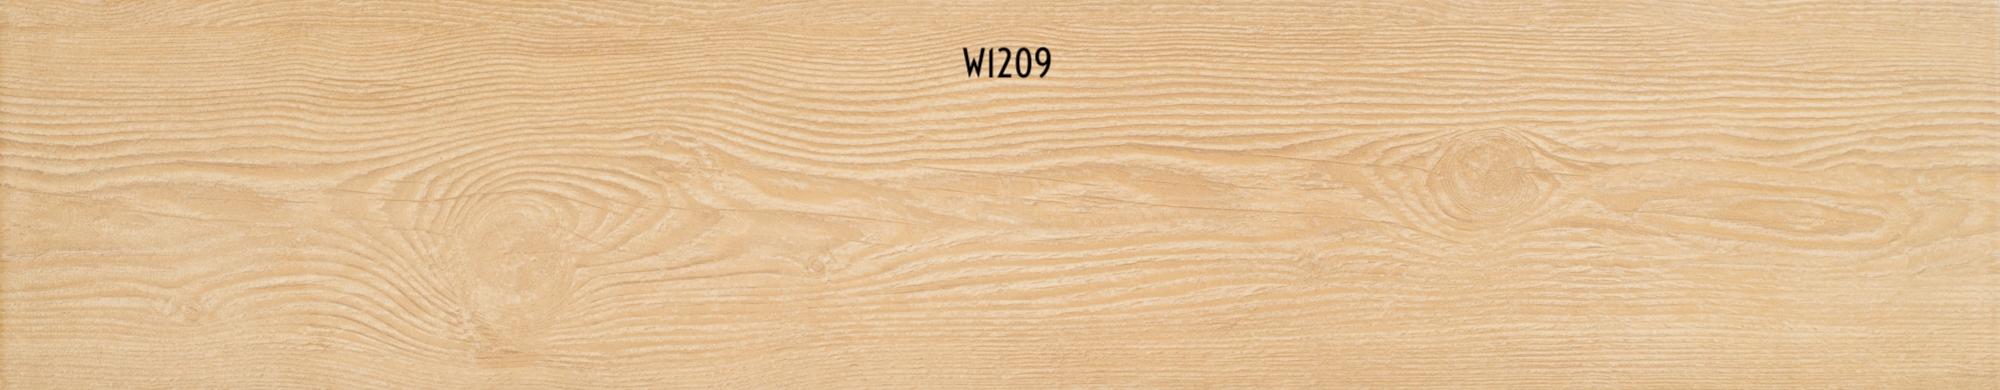 W1209